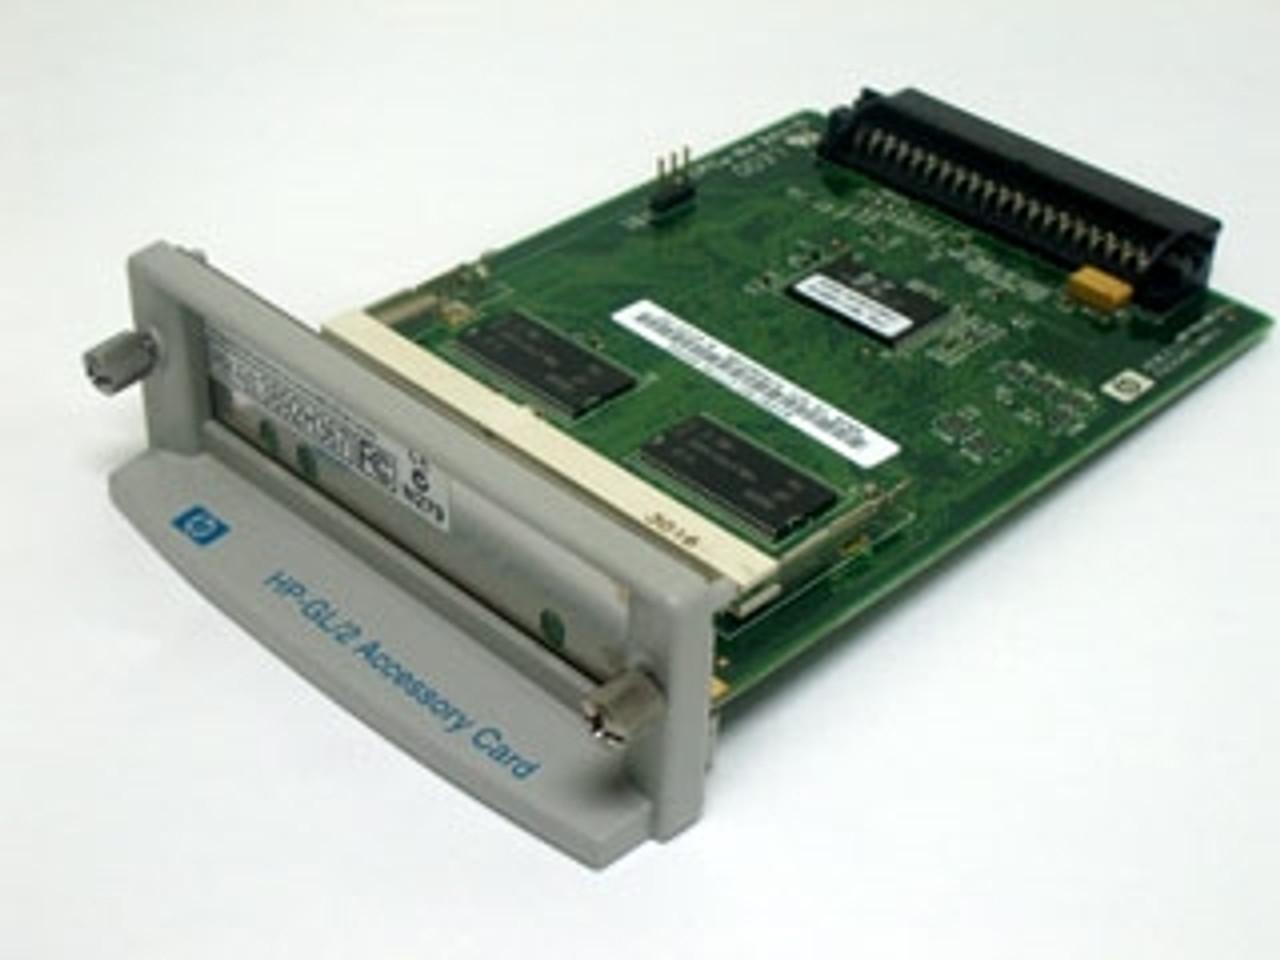 HP Designjet 500 GL2 Upgrade Card